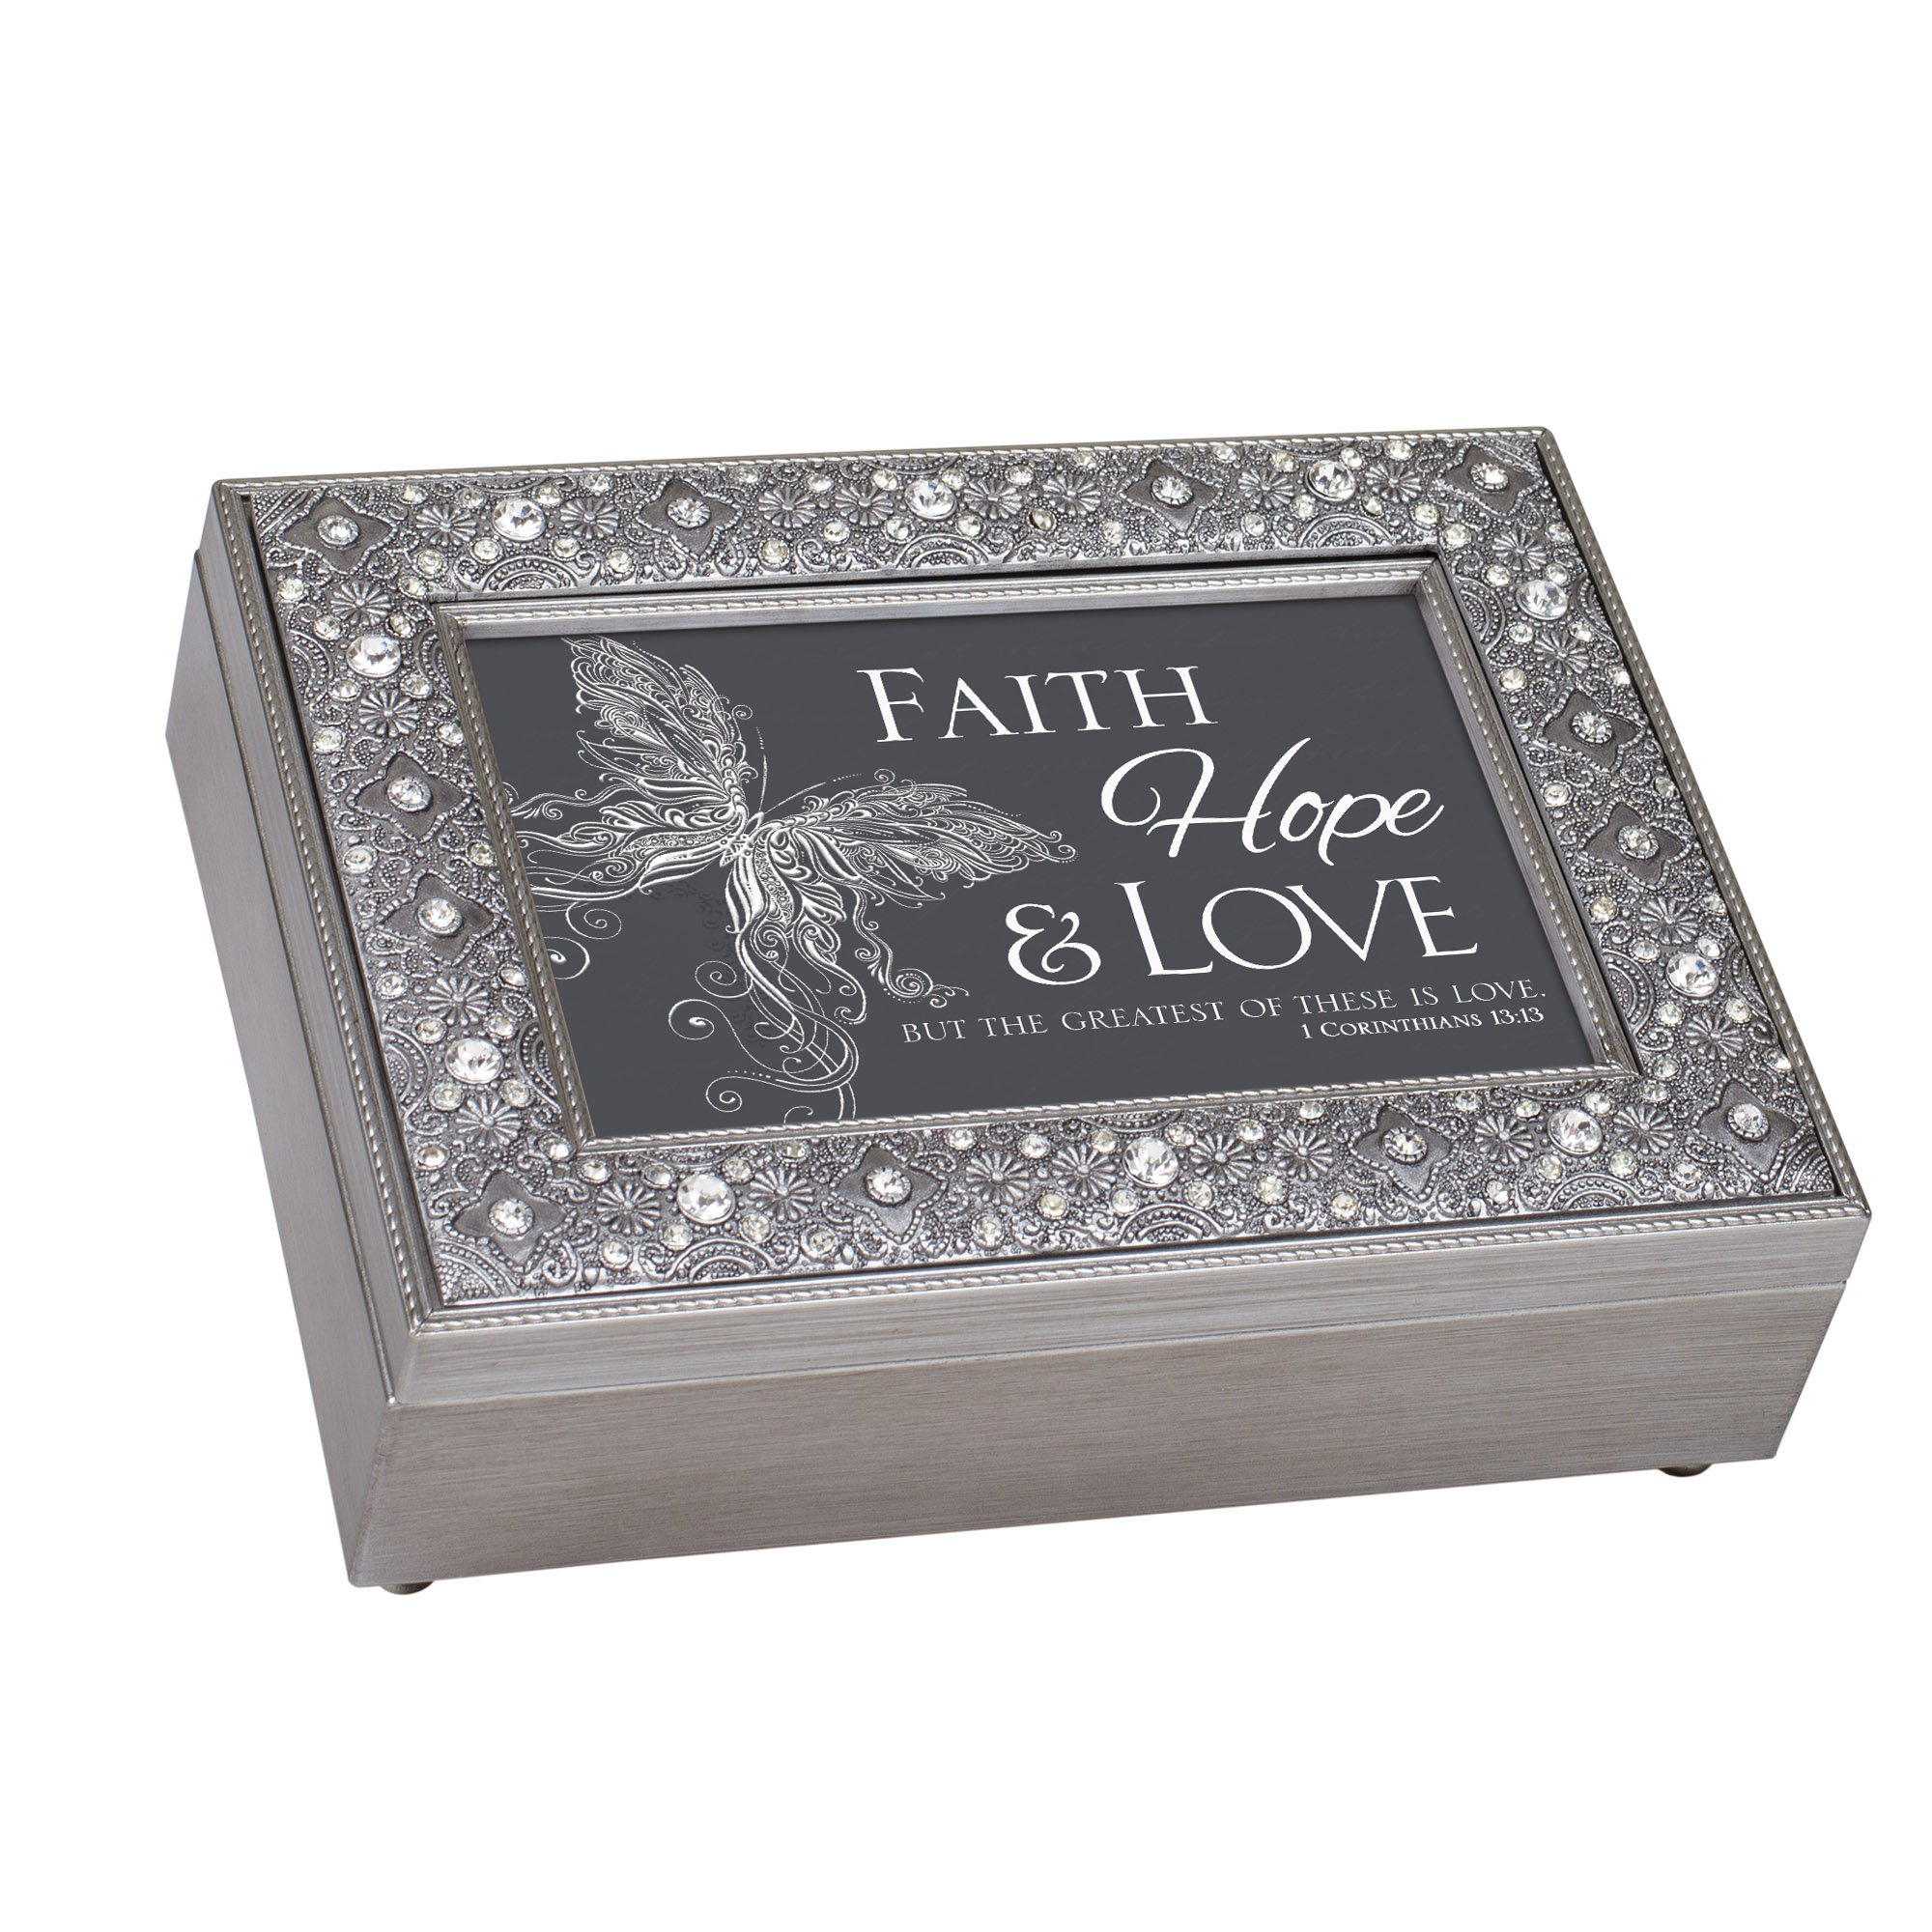 Cottage Garden Faith Hope Love Filigree Jewel Bead Silver Tone Music Box Plays On Eagle's Wings